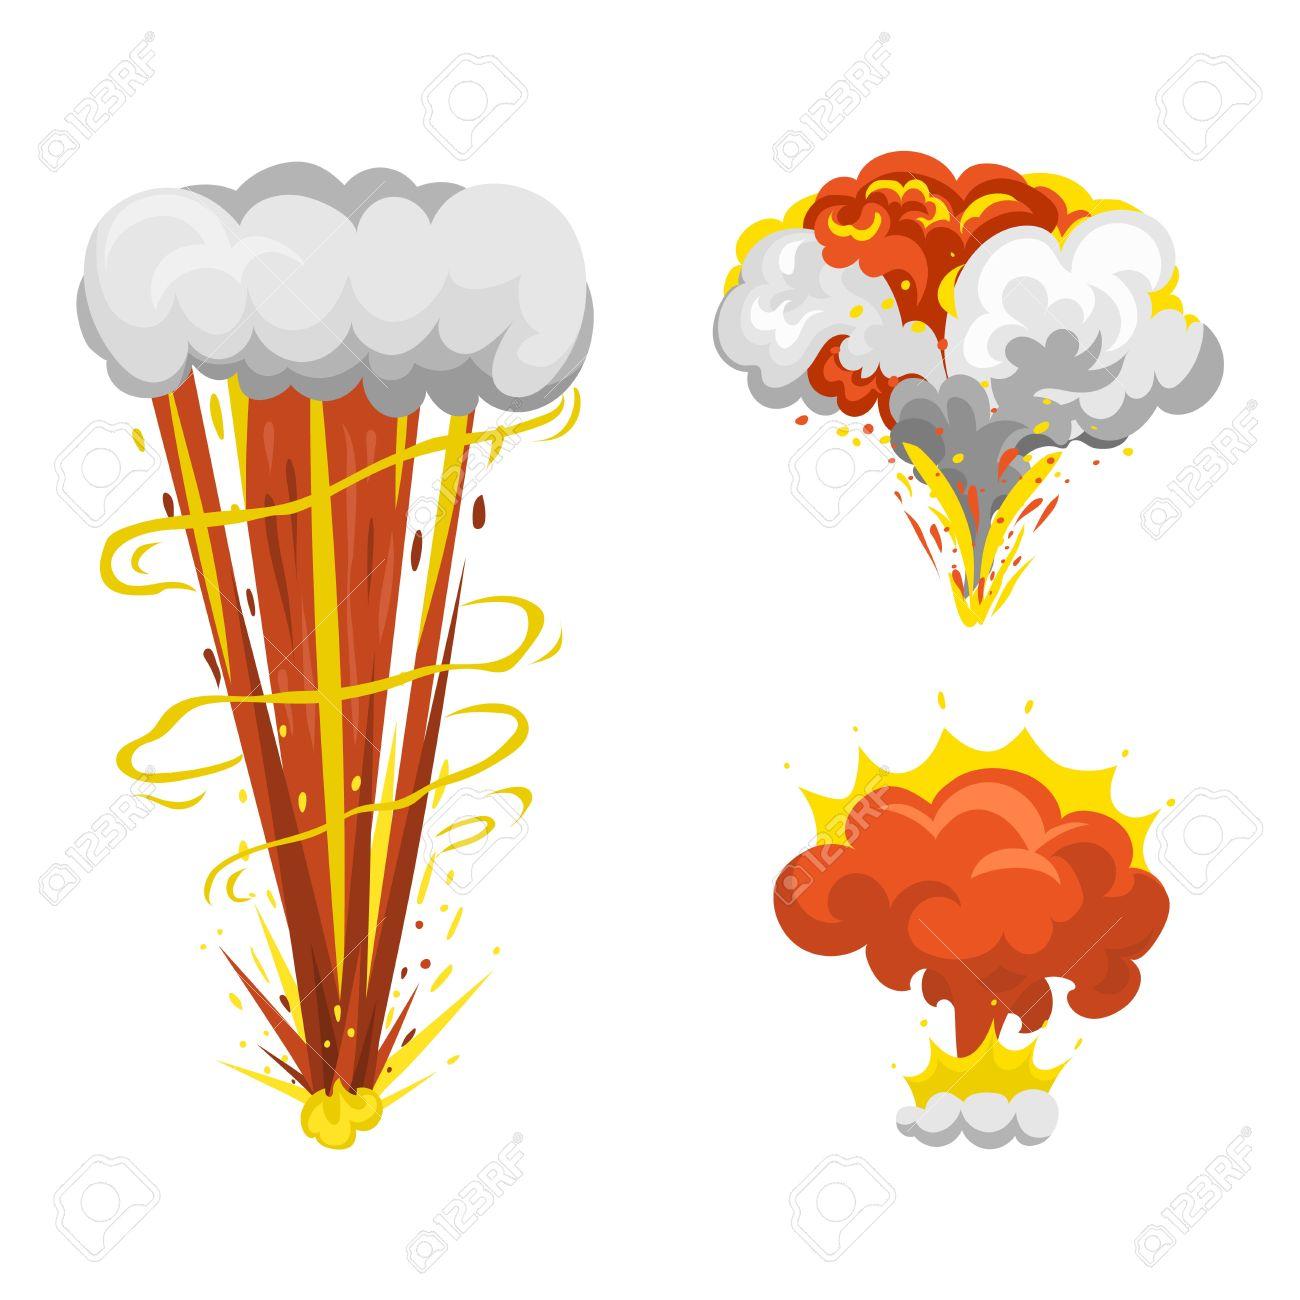 Fire explosion free collection. Burst clipart cloud burst